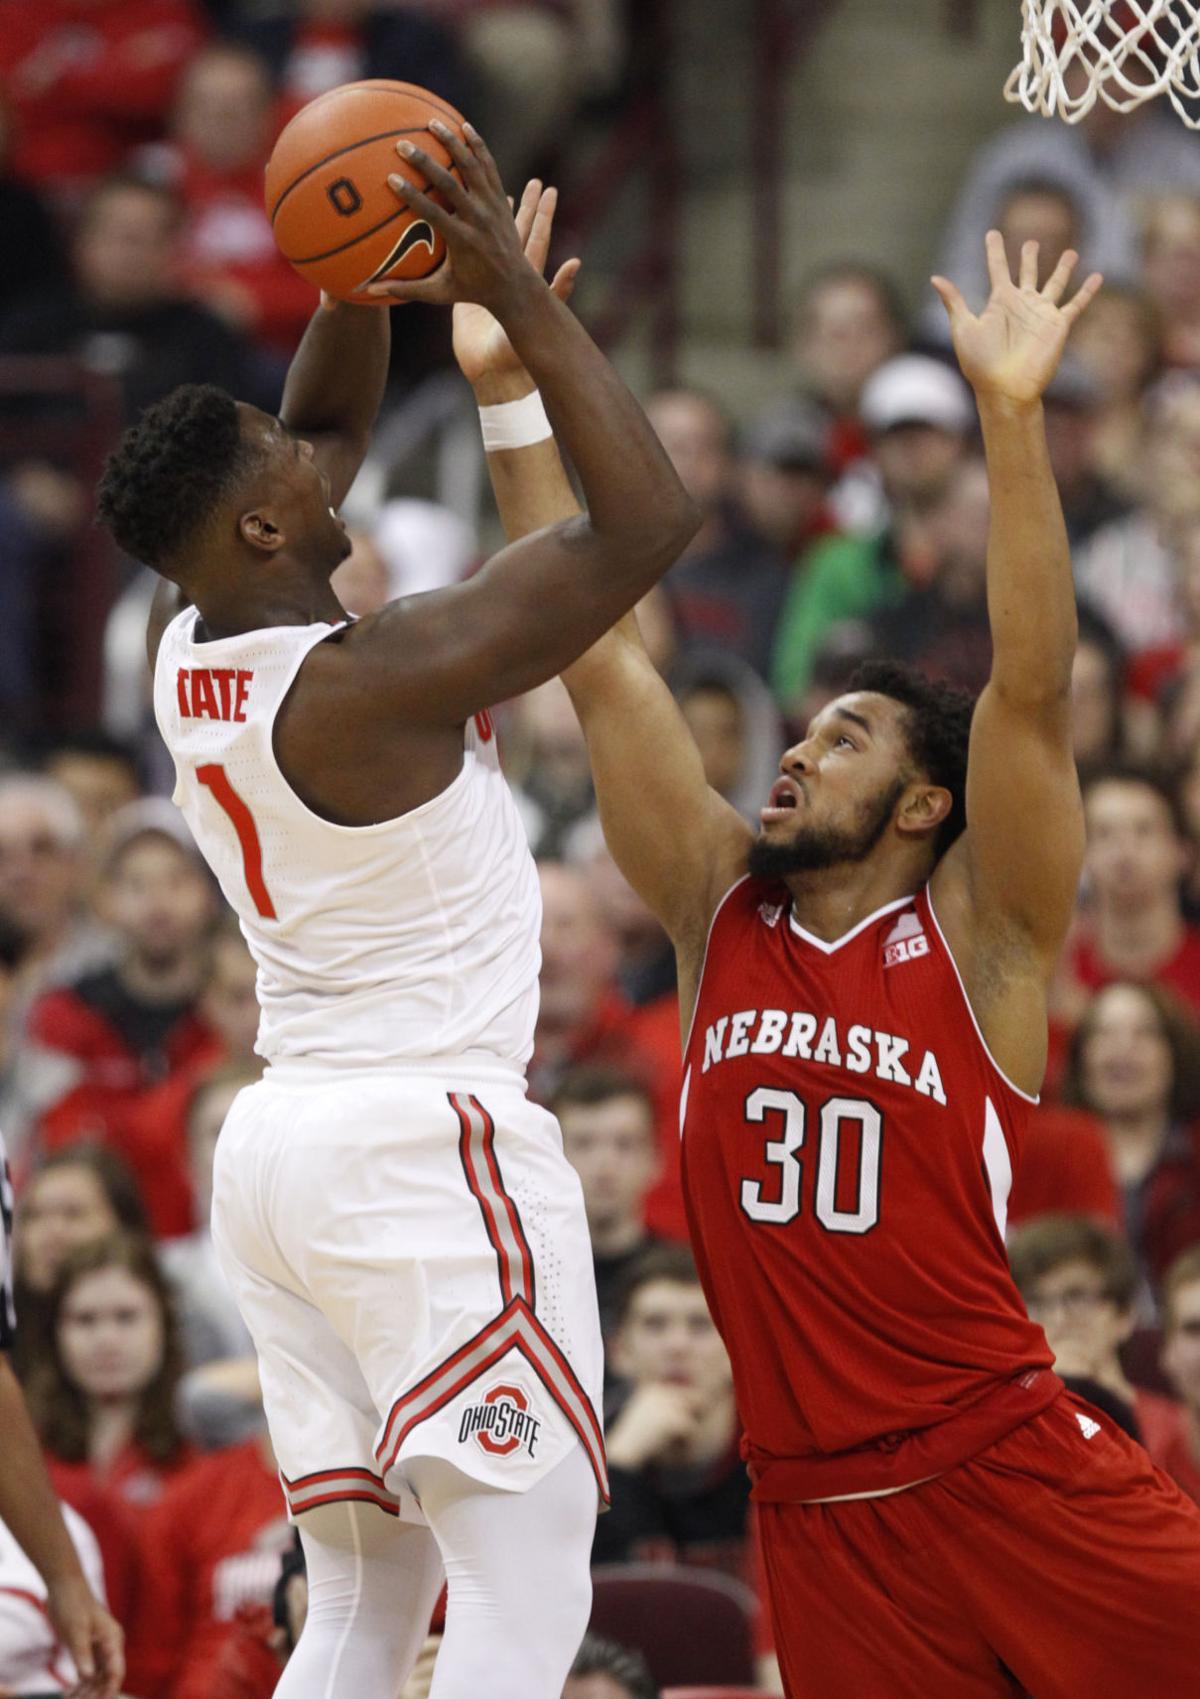 Nebraska Ohio St Basketball